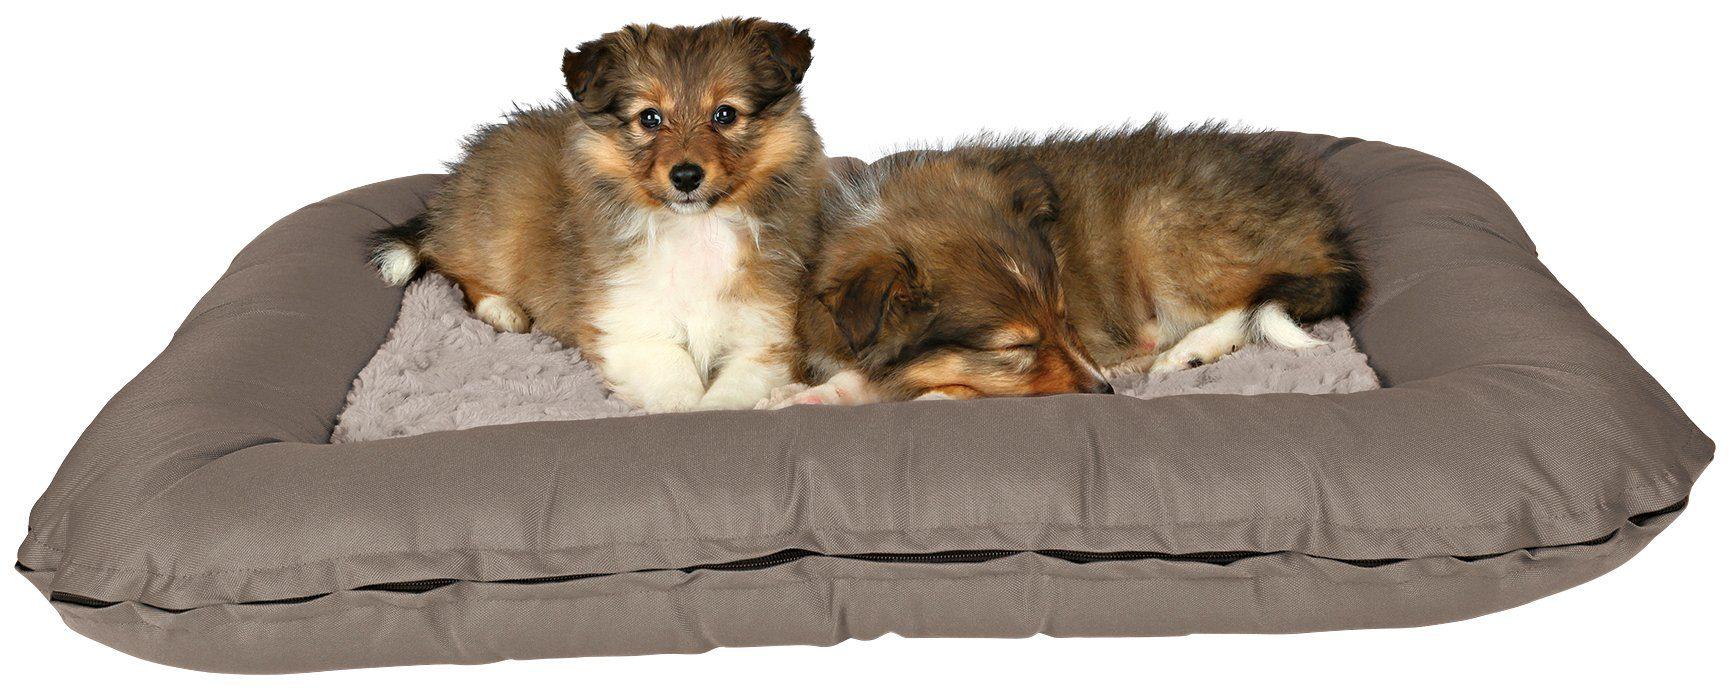 Hundekissen »Drago Cosy«, BxL: 80x60 cm